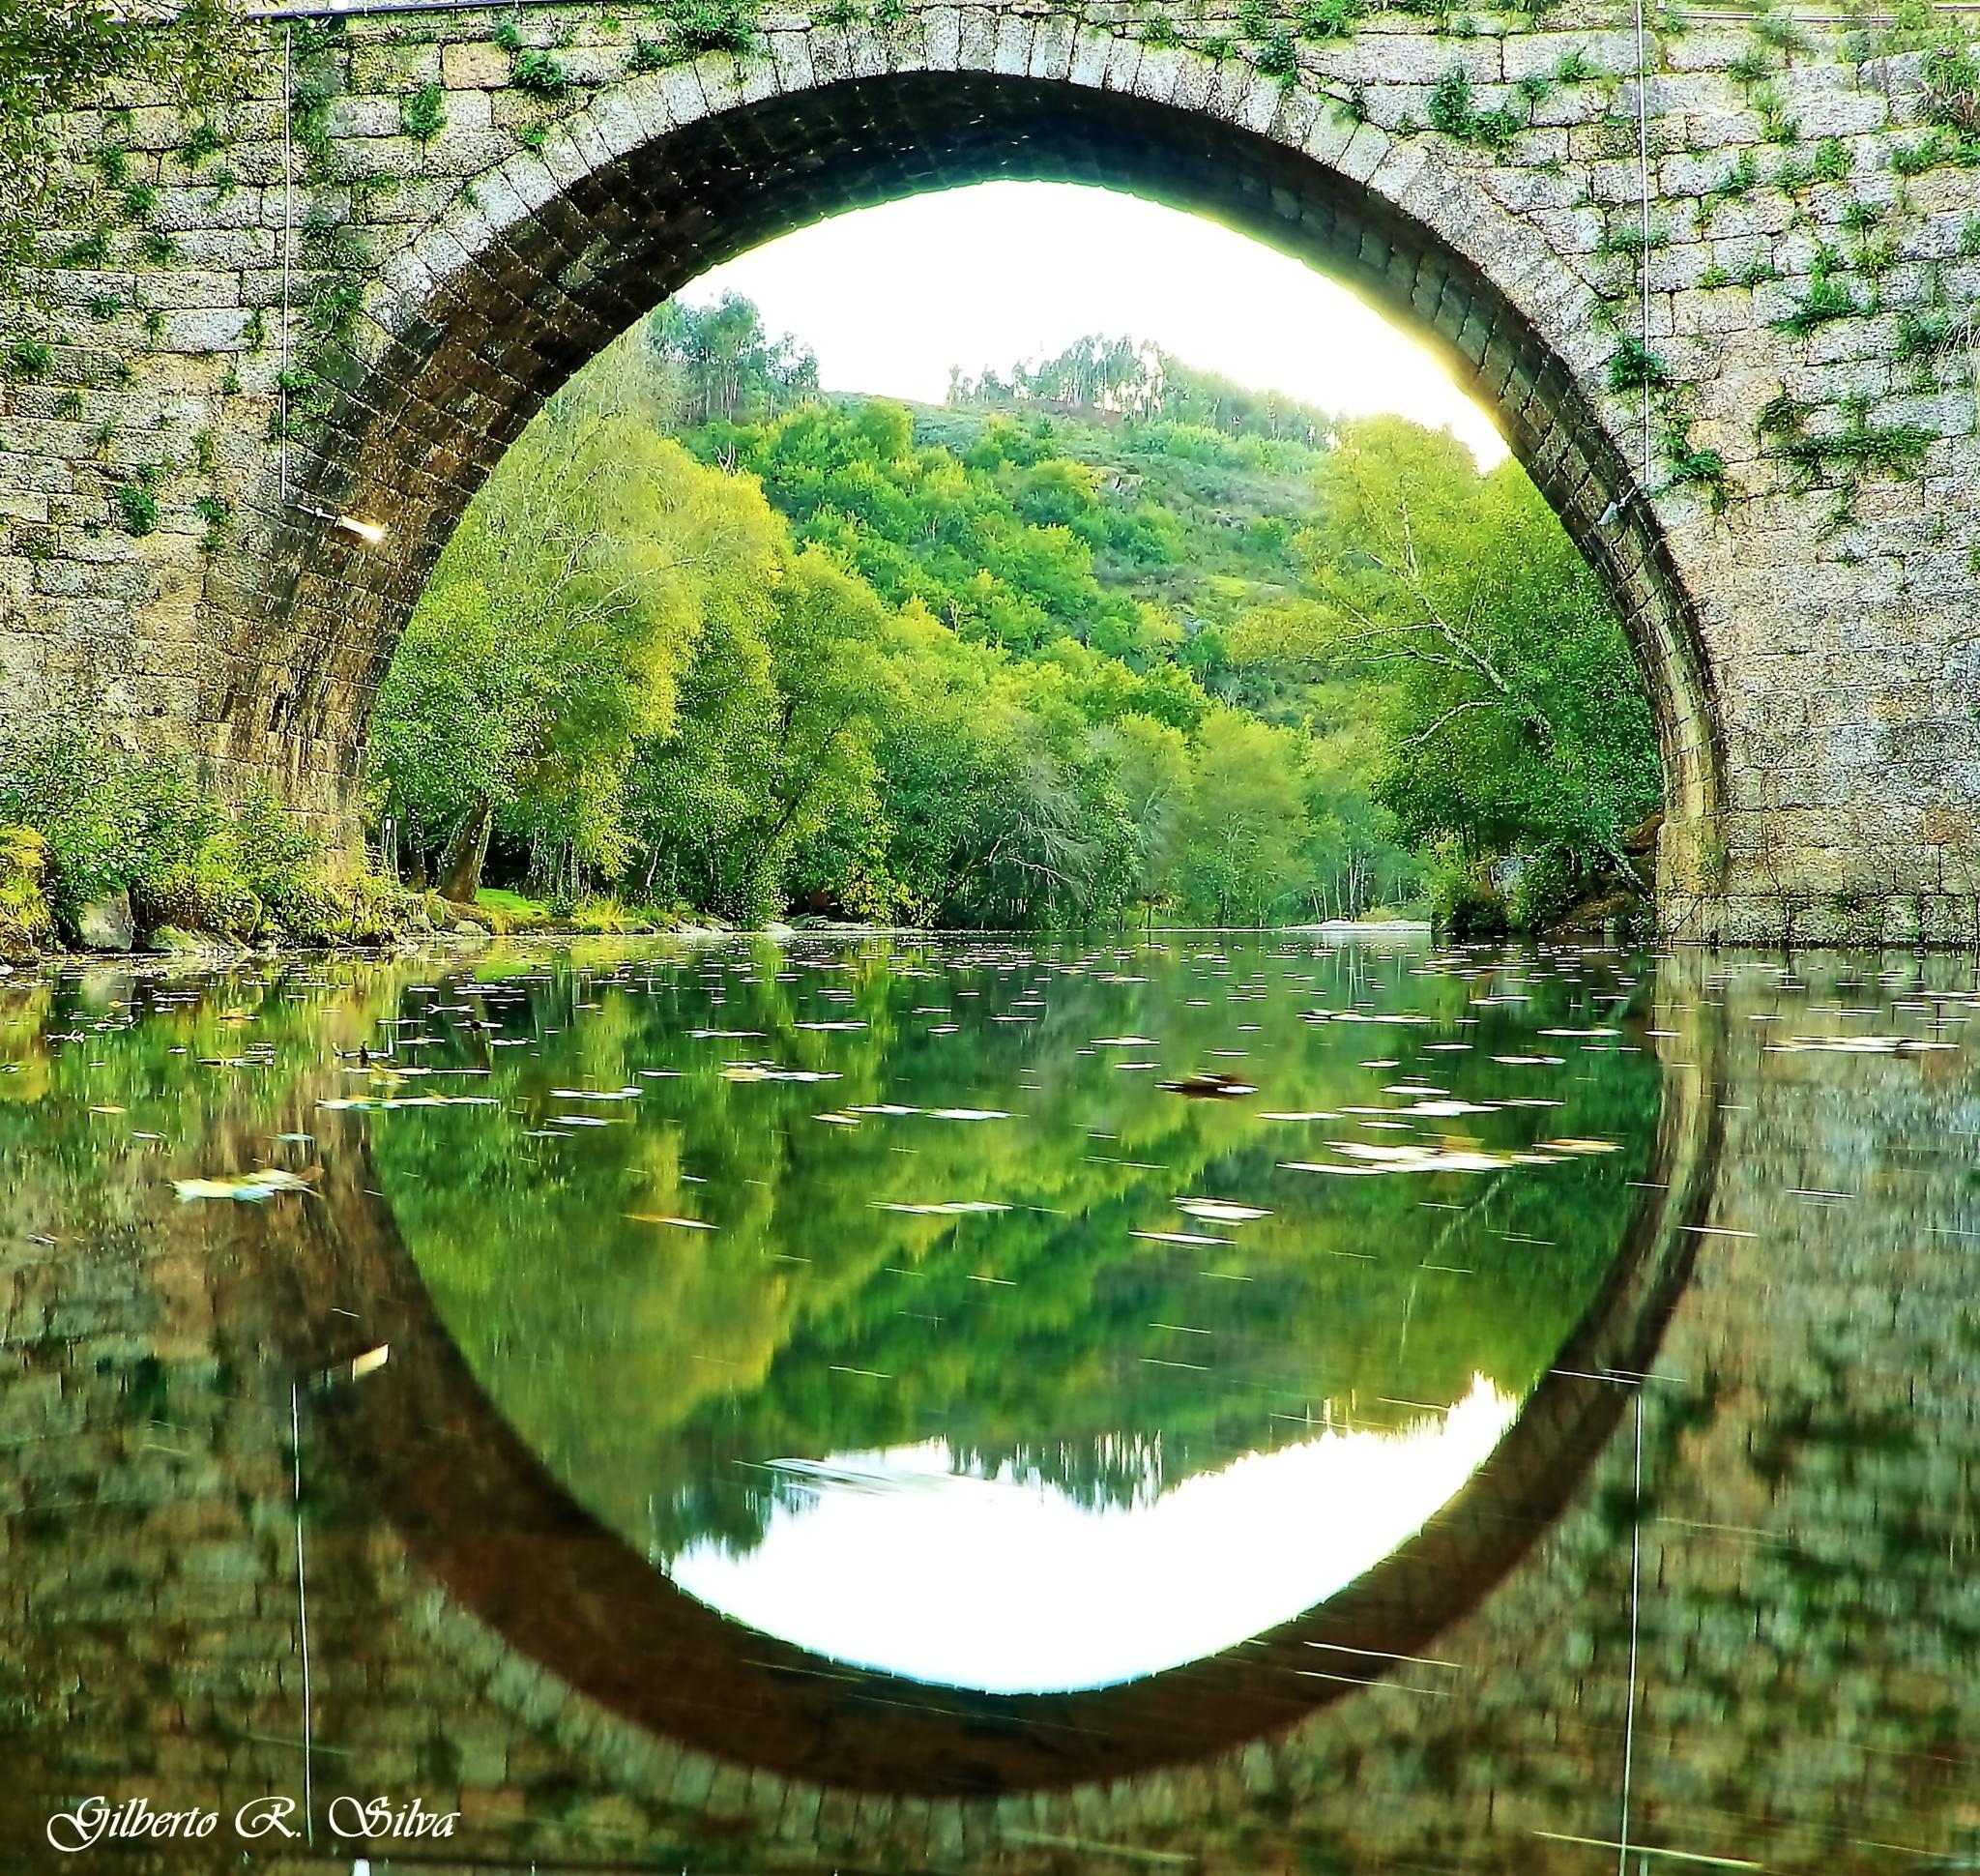 Espelho da Natureza by Gill Silva